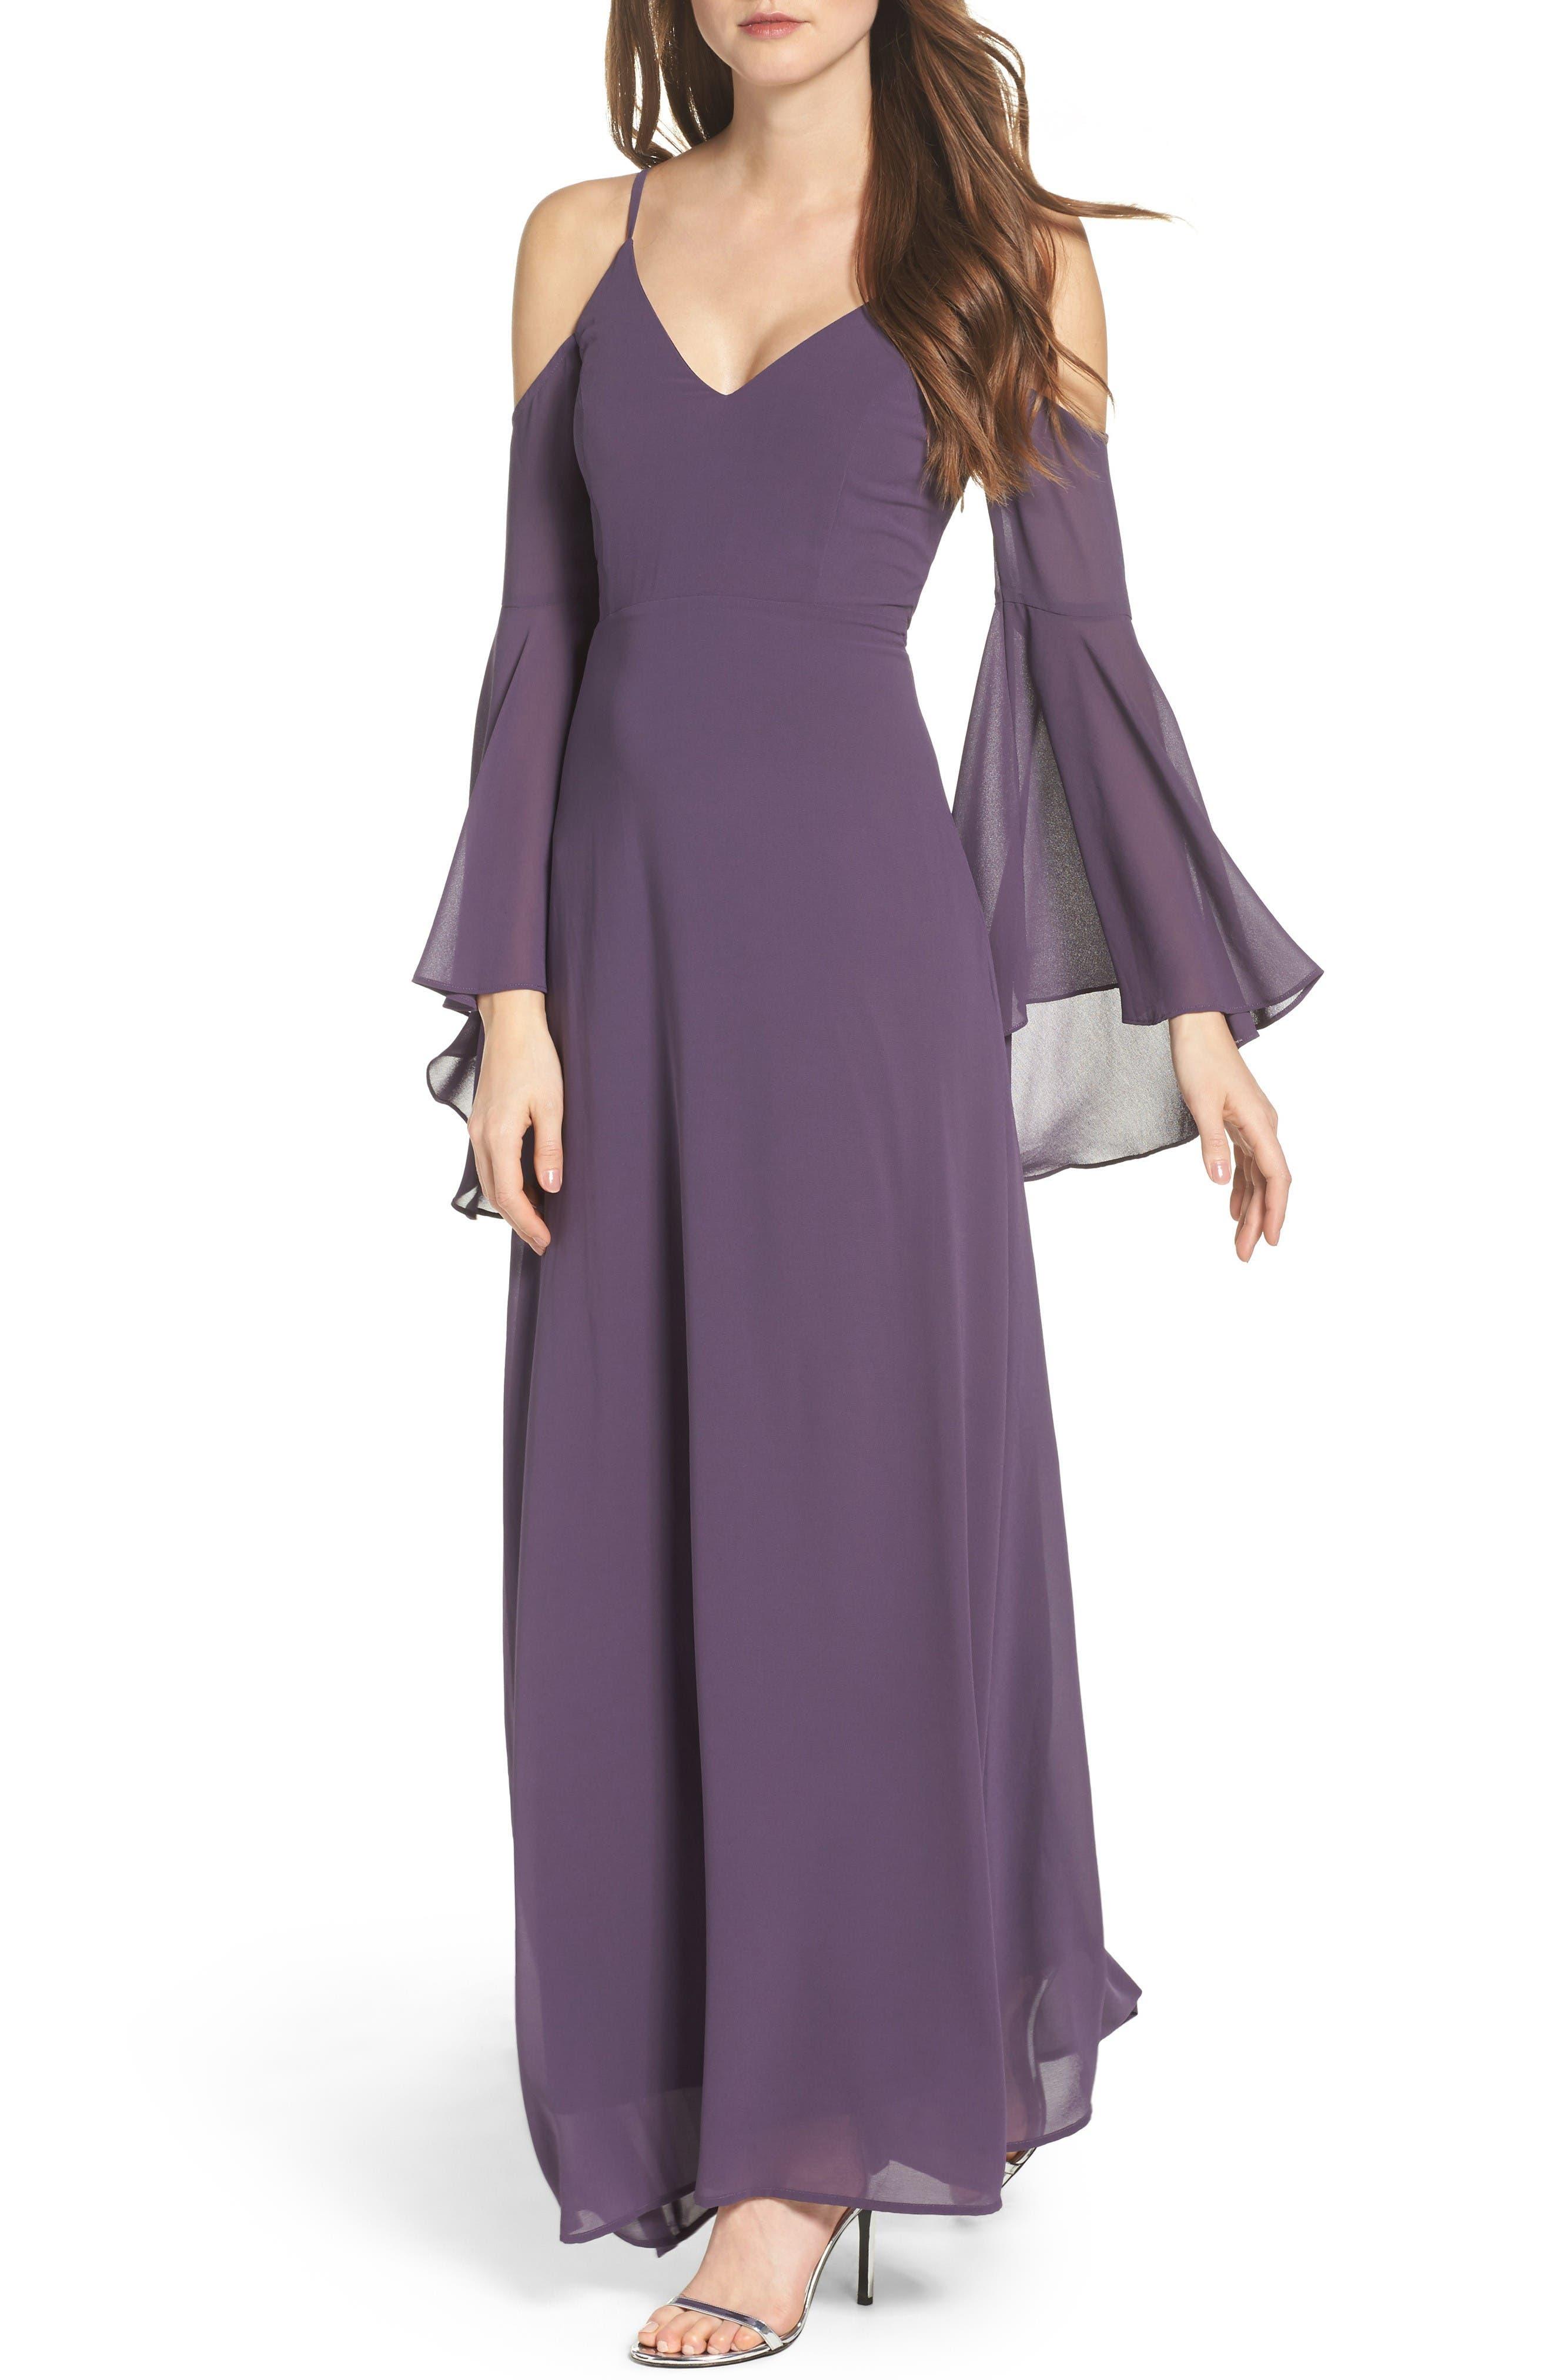 Main Image - Lulus Cold Shoulder Chiffon Maxi Dress